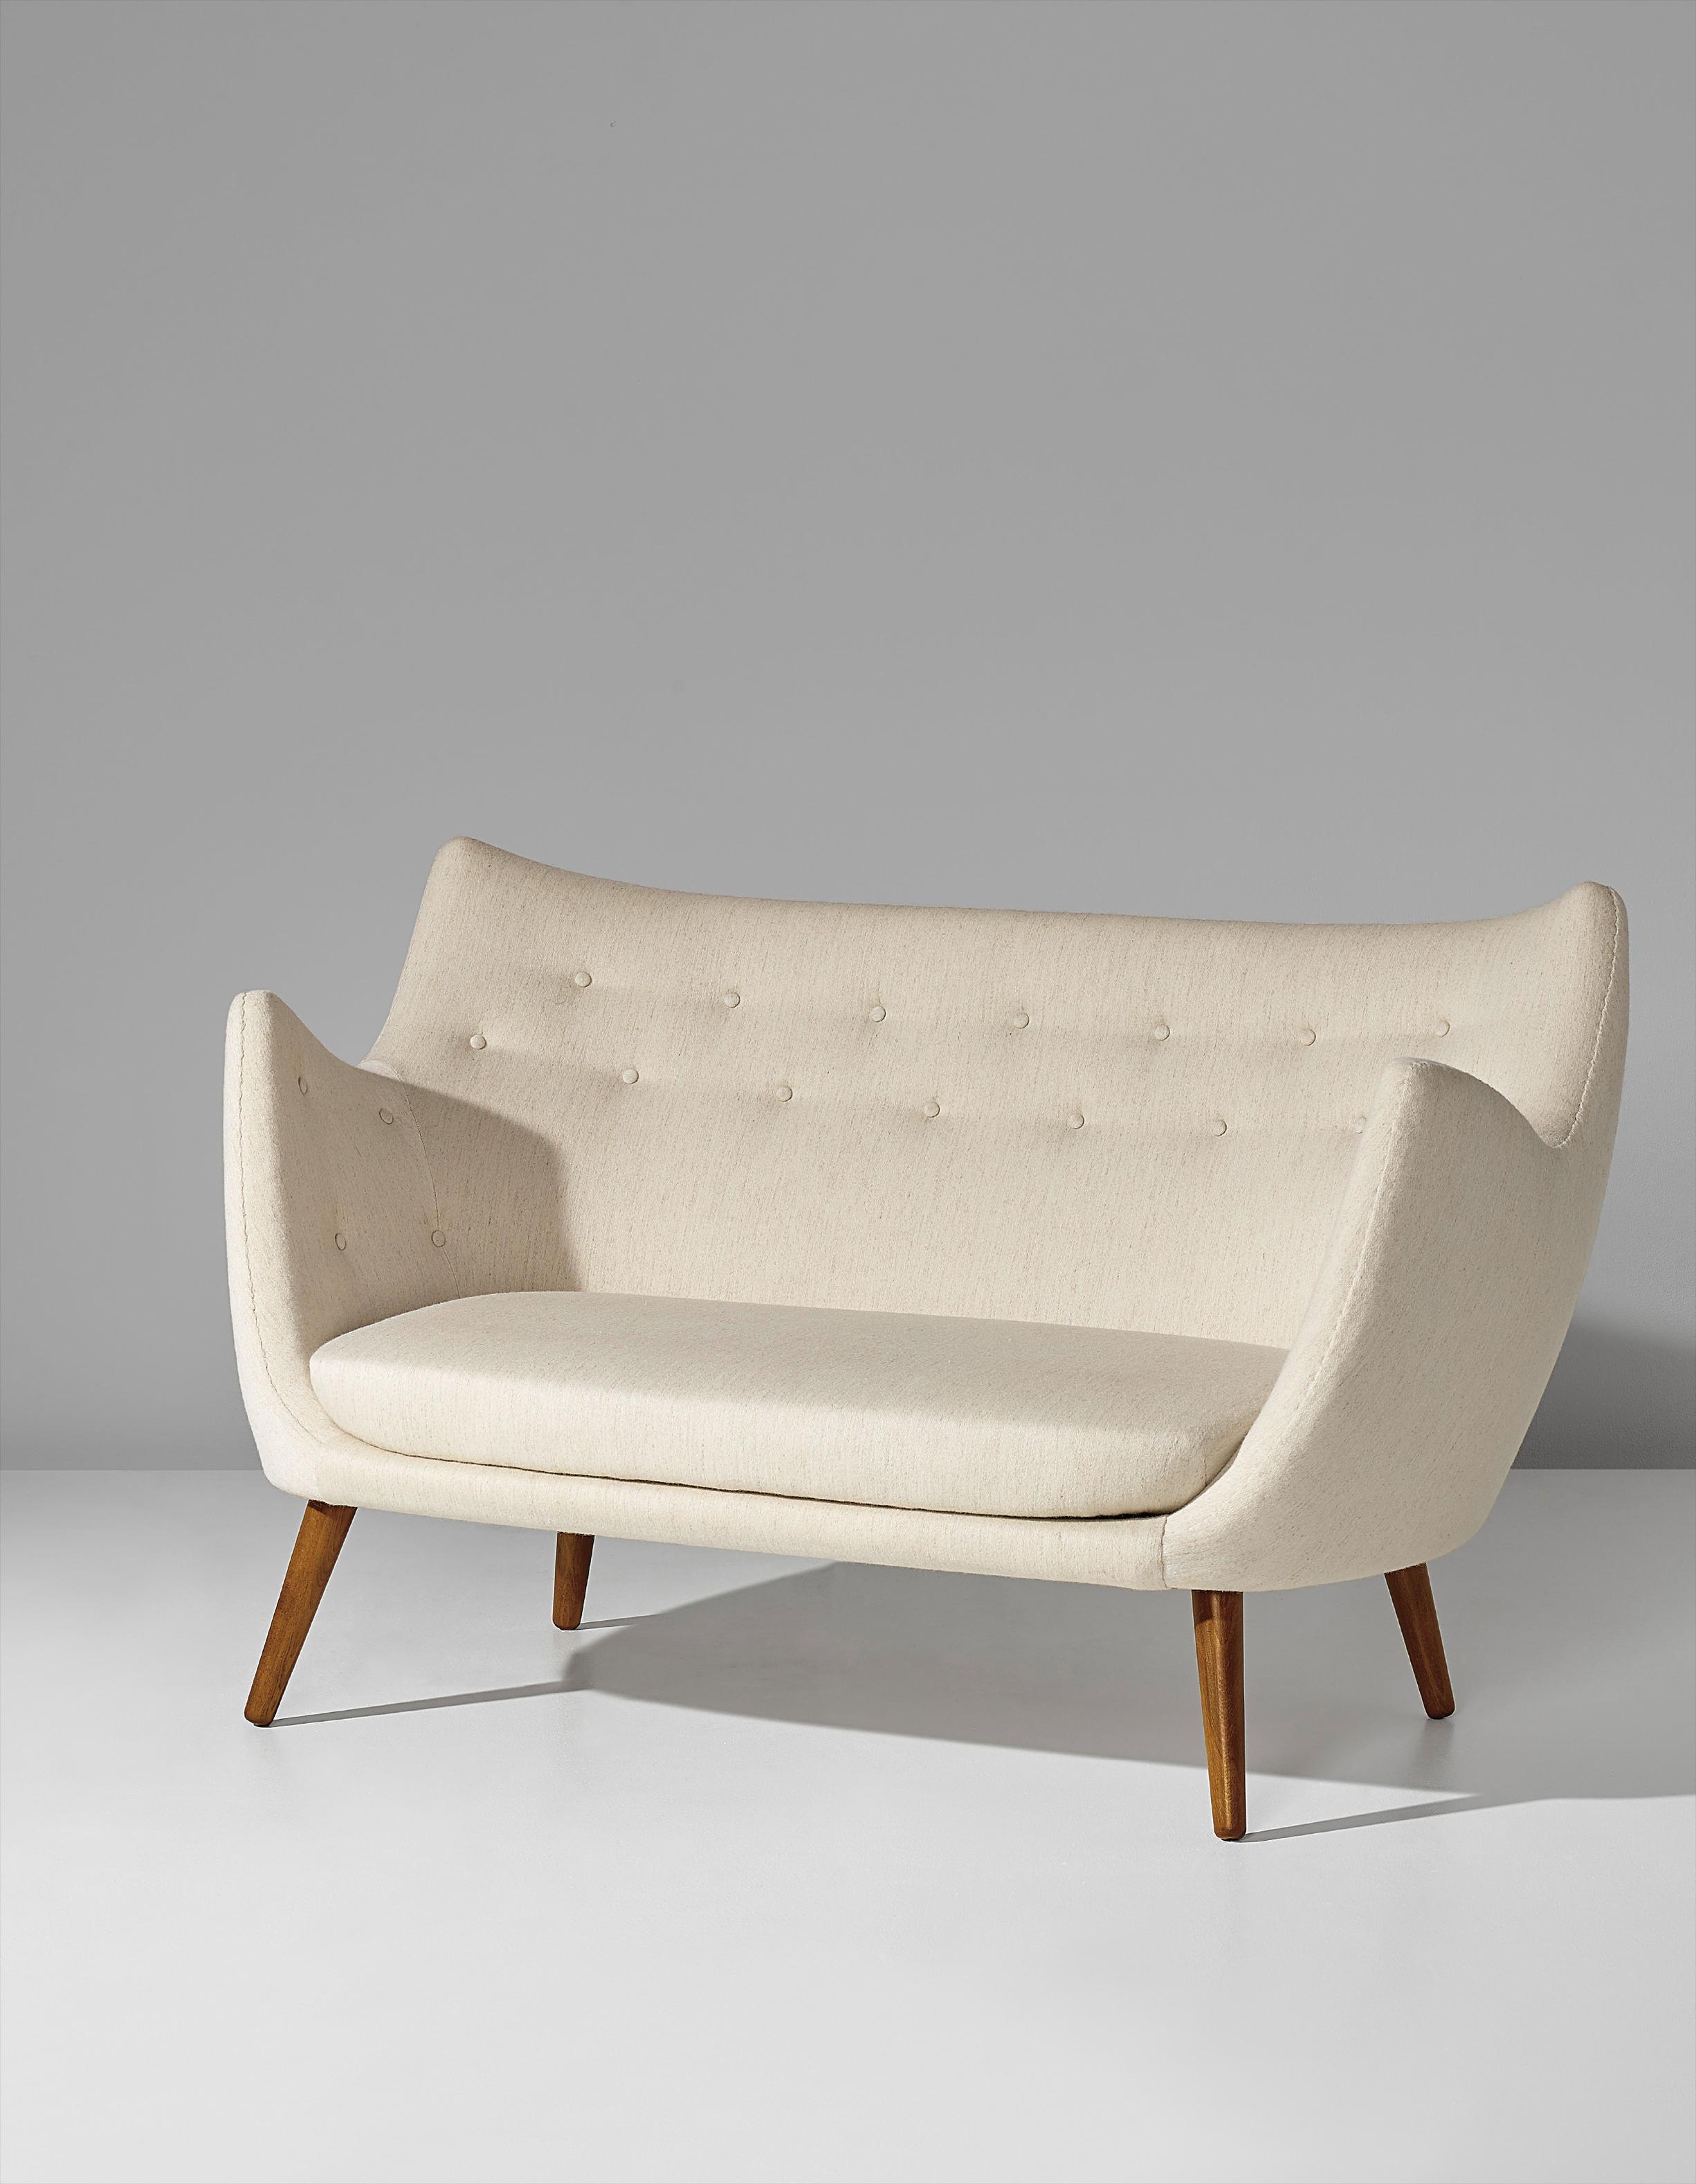 Finn Juhl-Early Two-Seater Sofa, Model No. Fj 41-1941